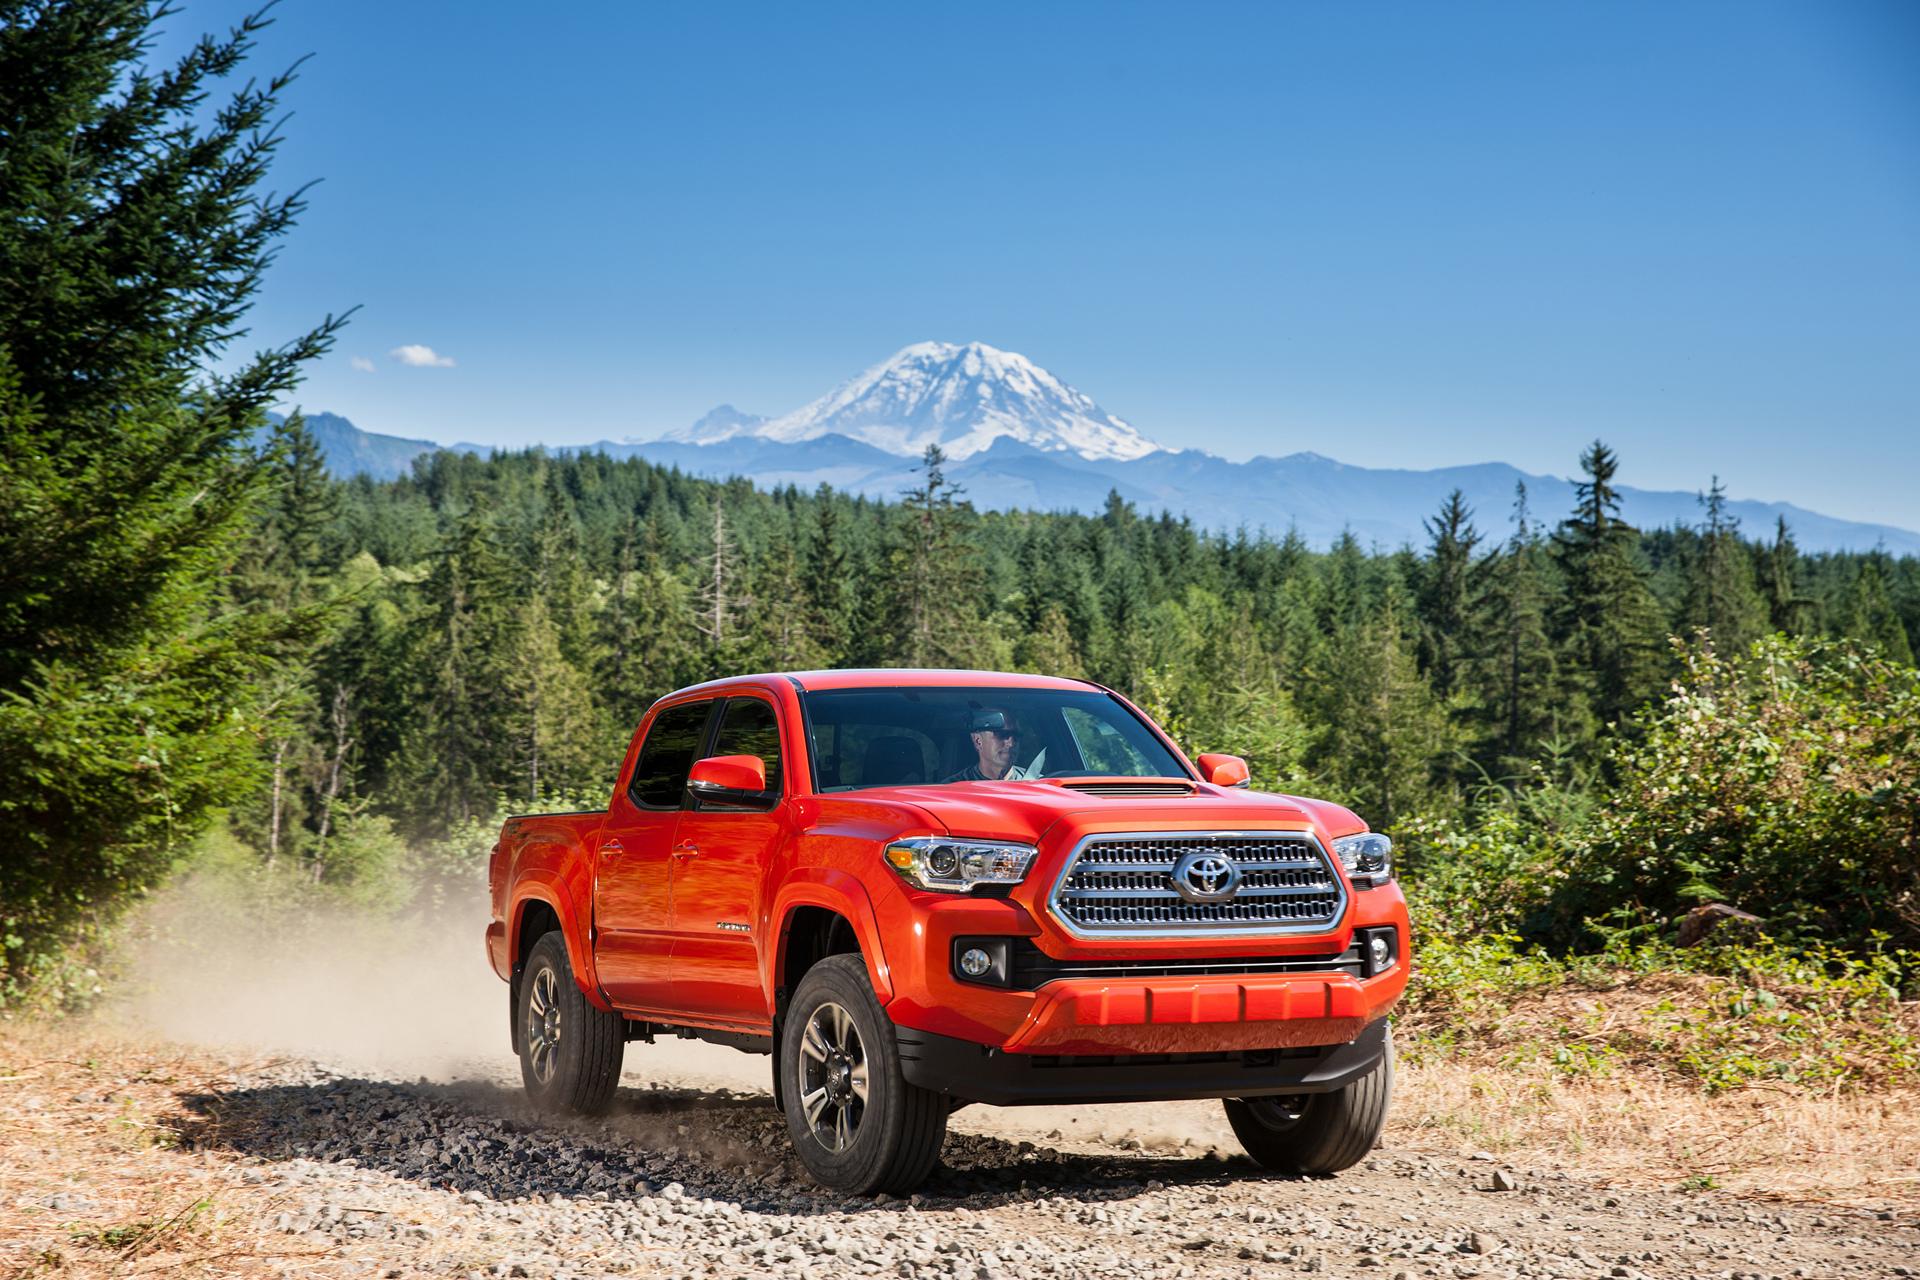 2016 Toyota Tacoma TRD Off-Road © Toyota Motor Corporation